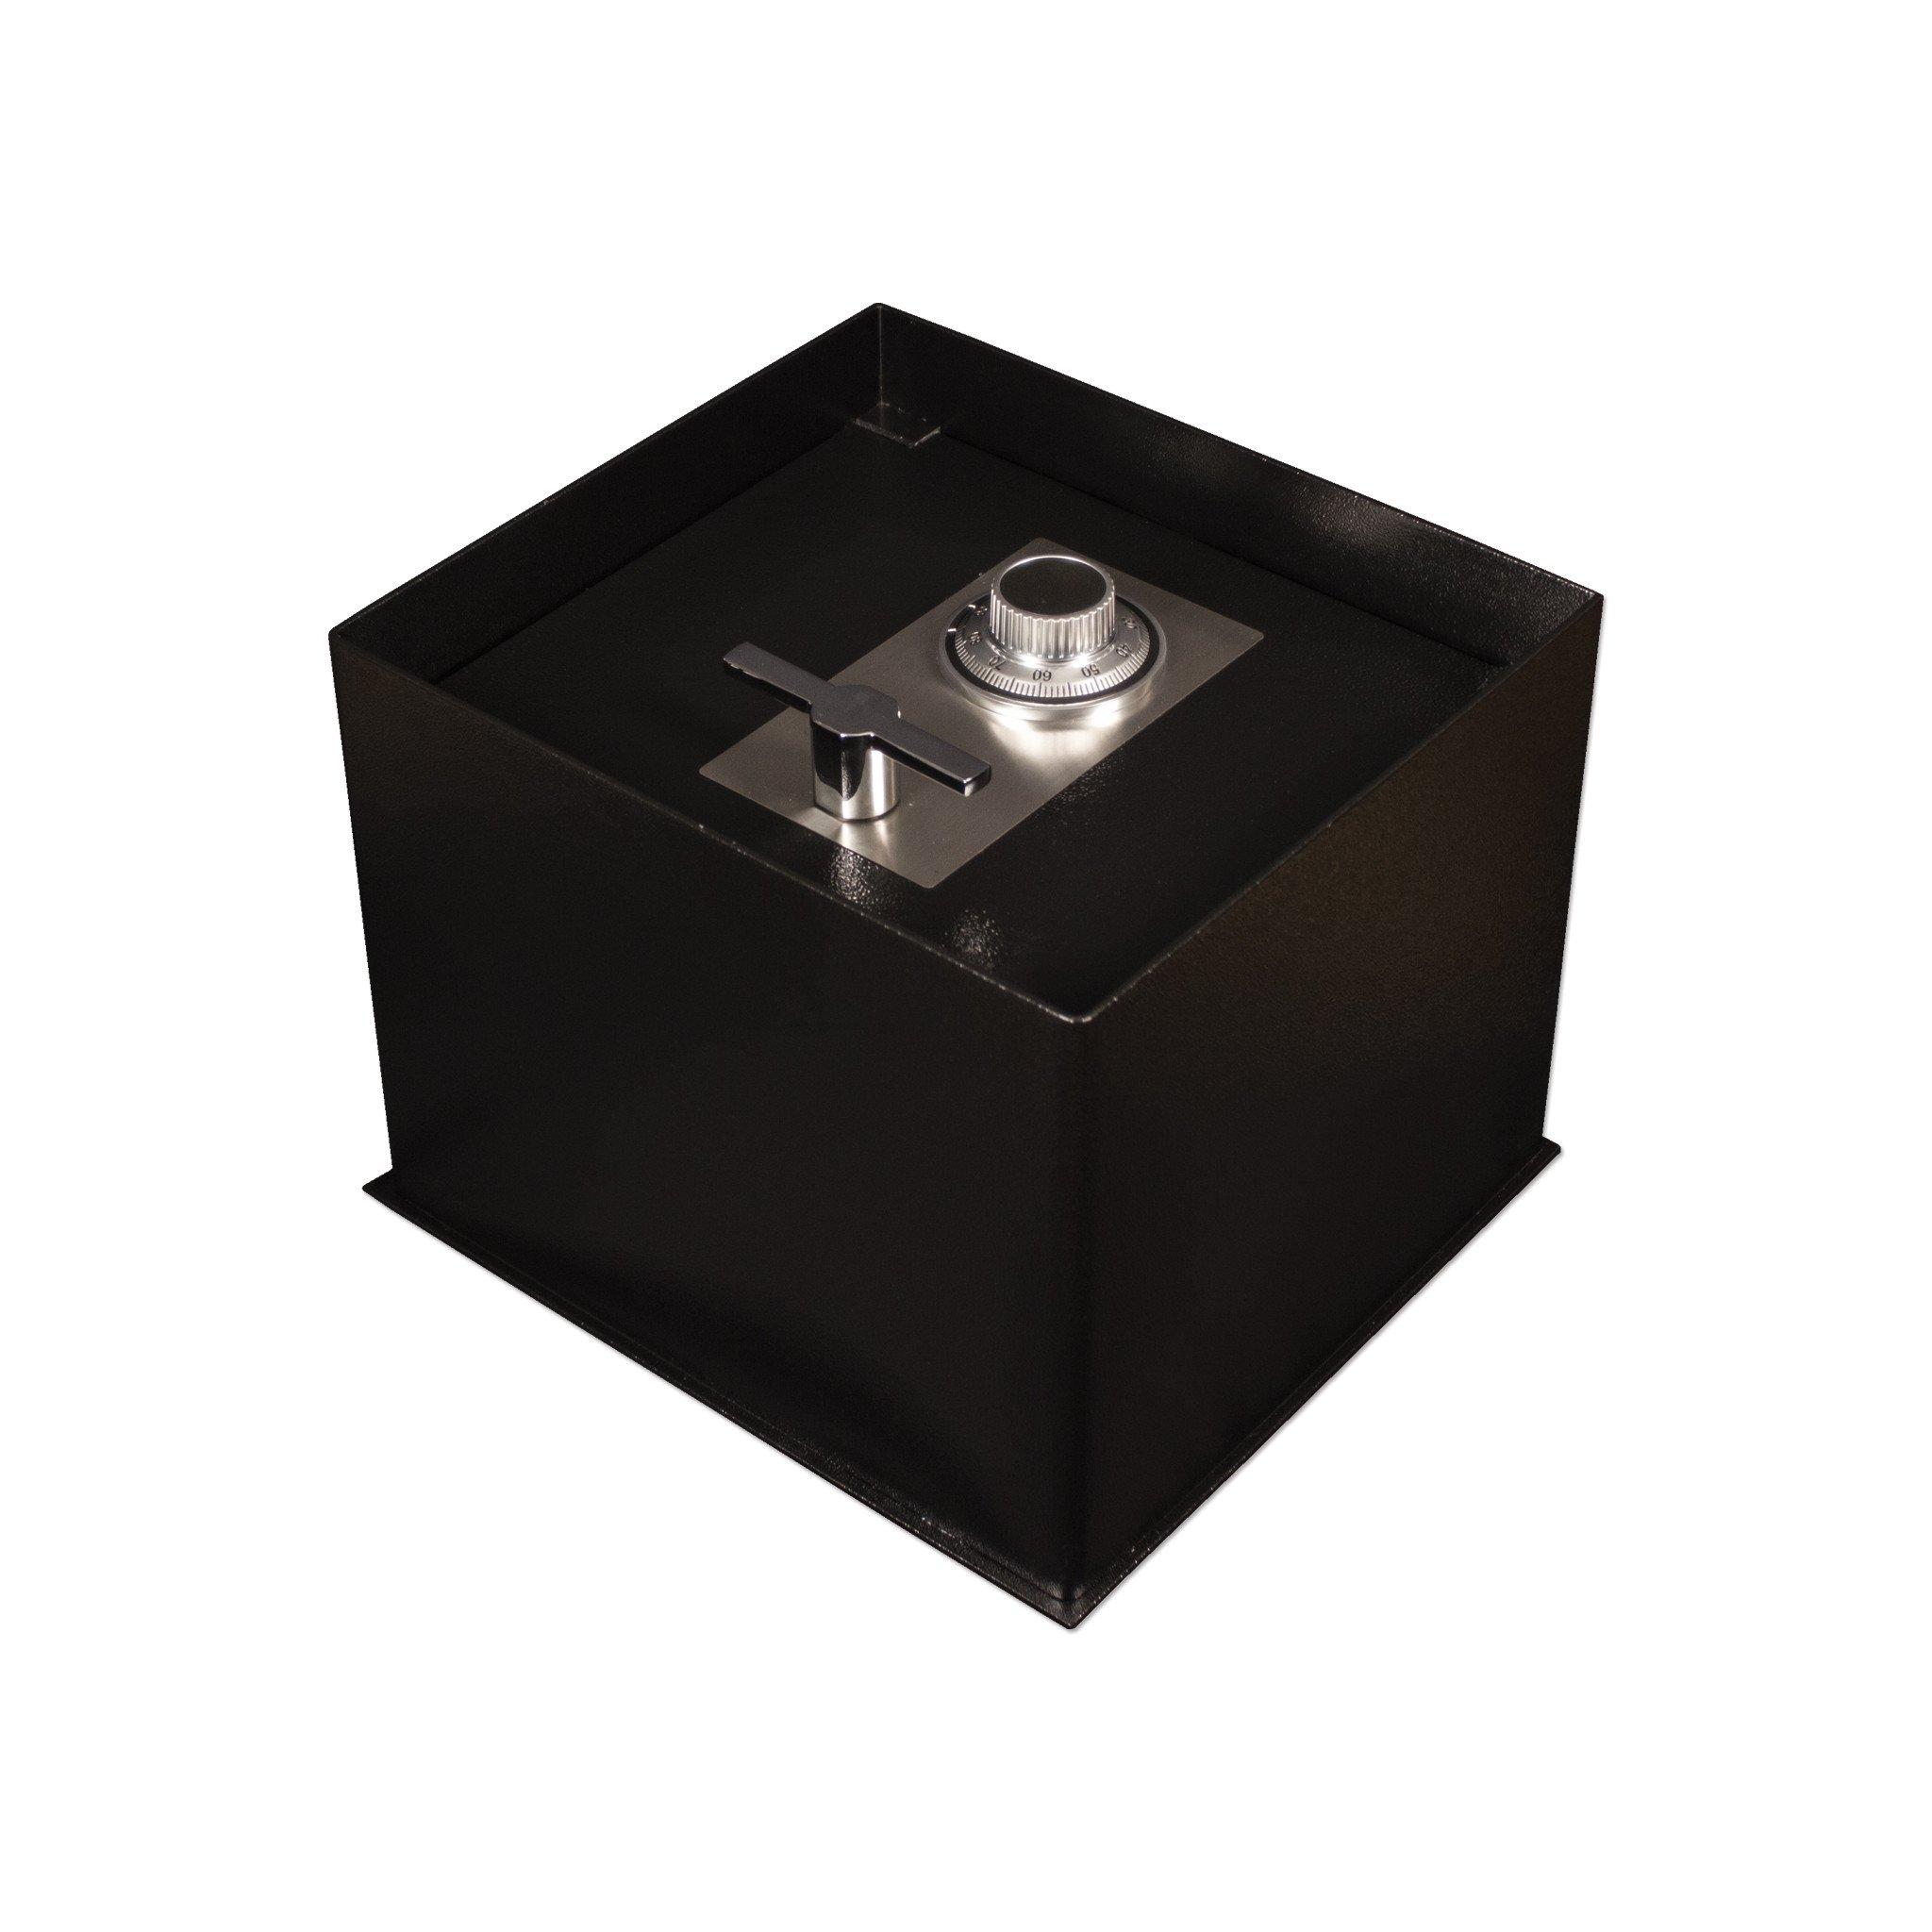 Tracker Safe FS121514-DLG Steel Floor Safe, Mechanical/Dial Lock, Black Powder Coat Paint, 1.49 cu. ft.